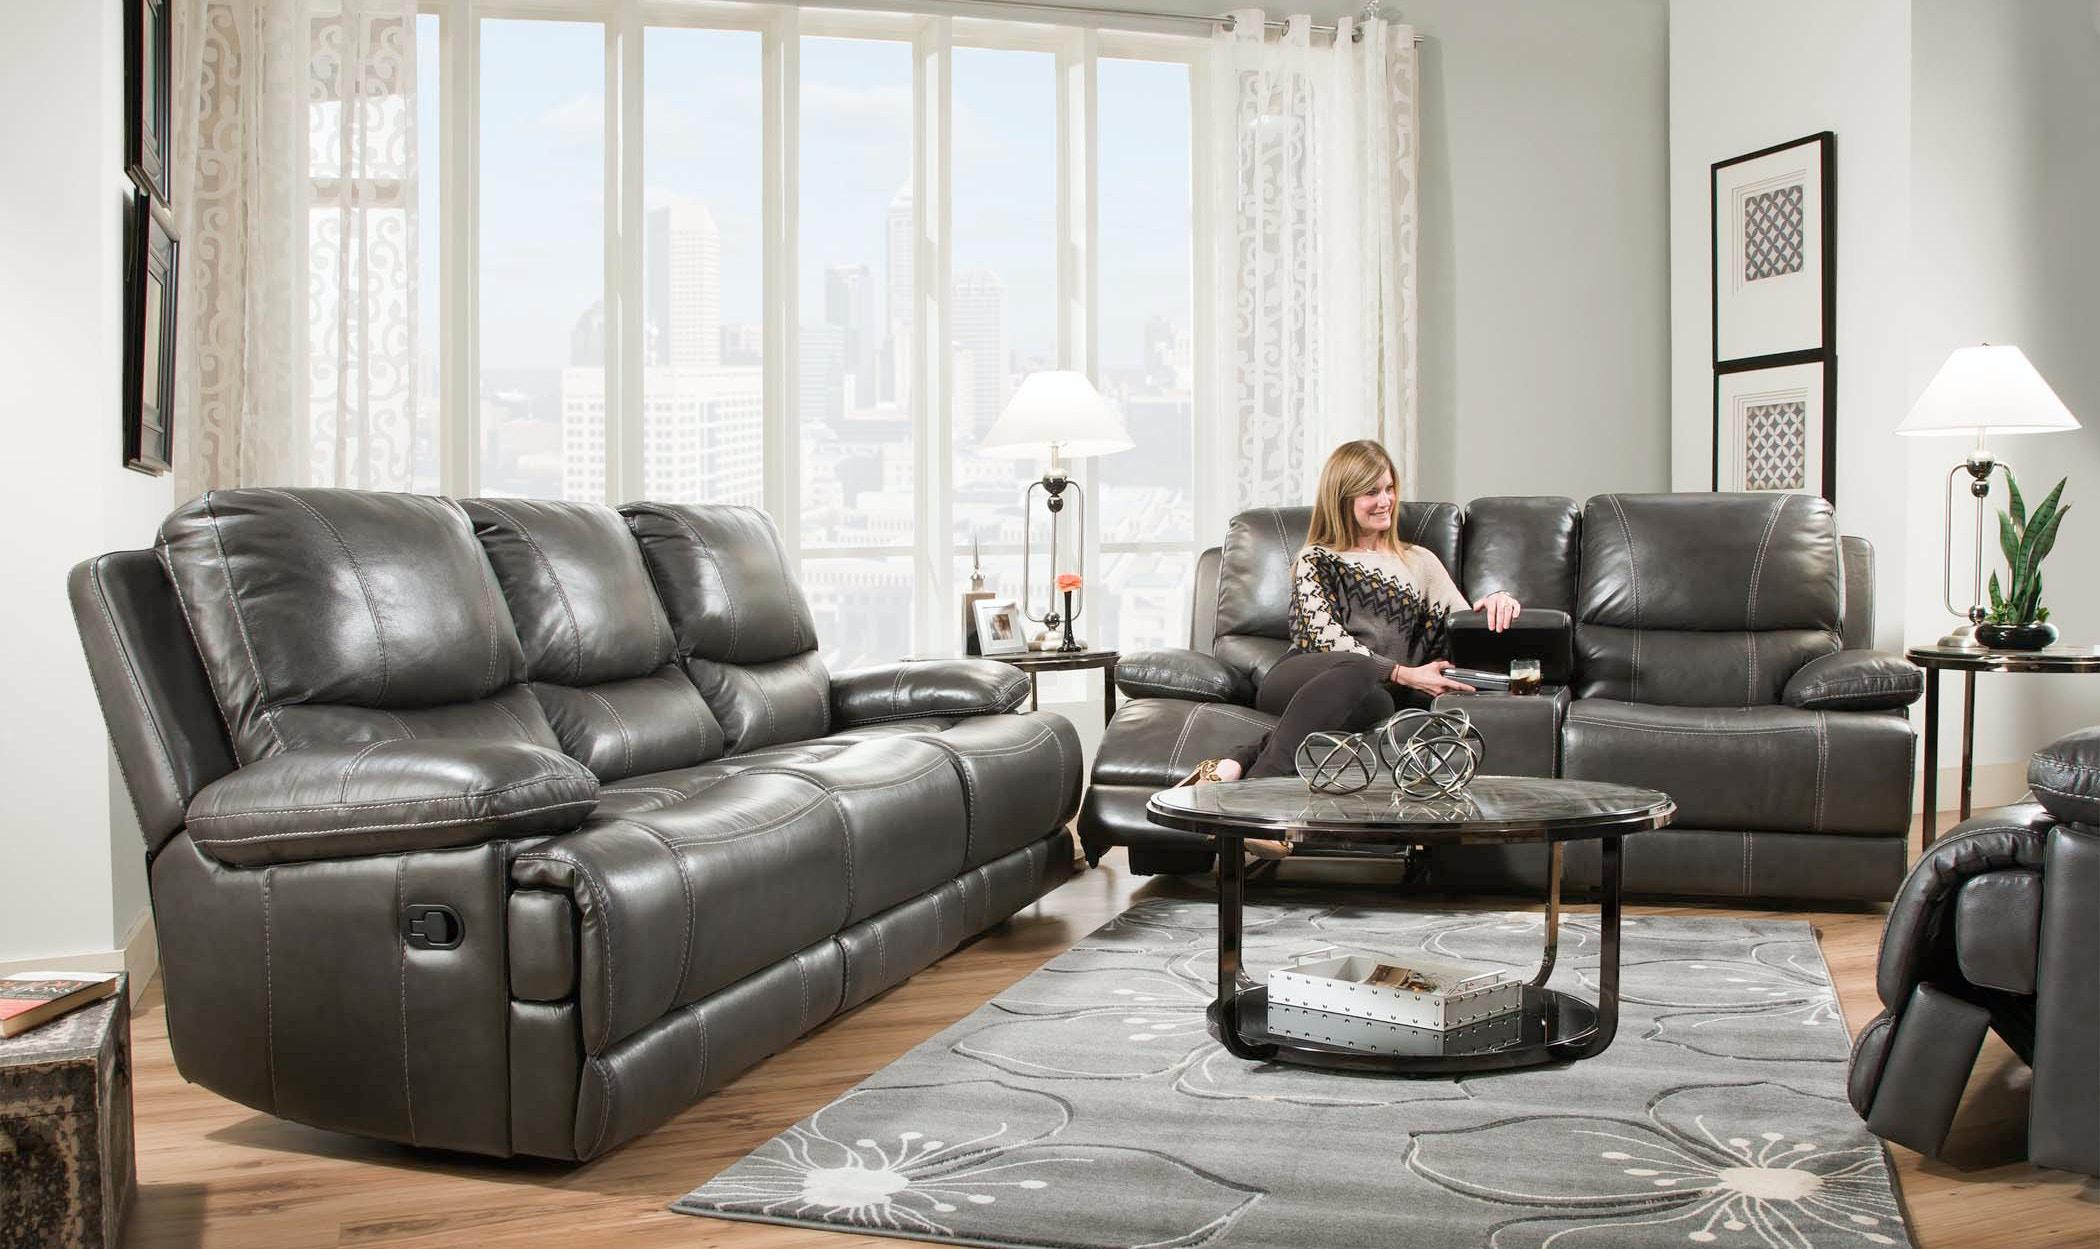 Corinthian Living Room Brooklyn Power Recliner 056155 Furniture Fair Cincinnati Dayton Oh